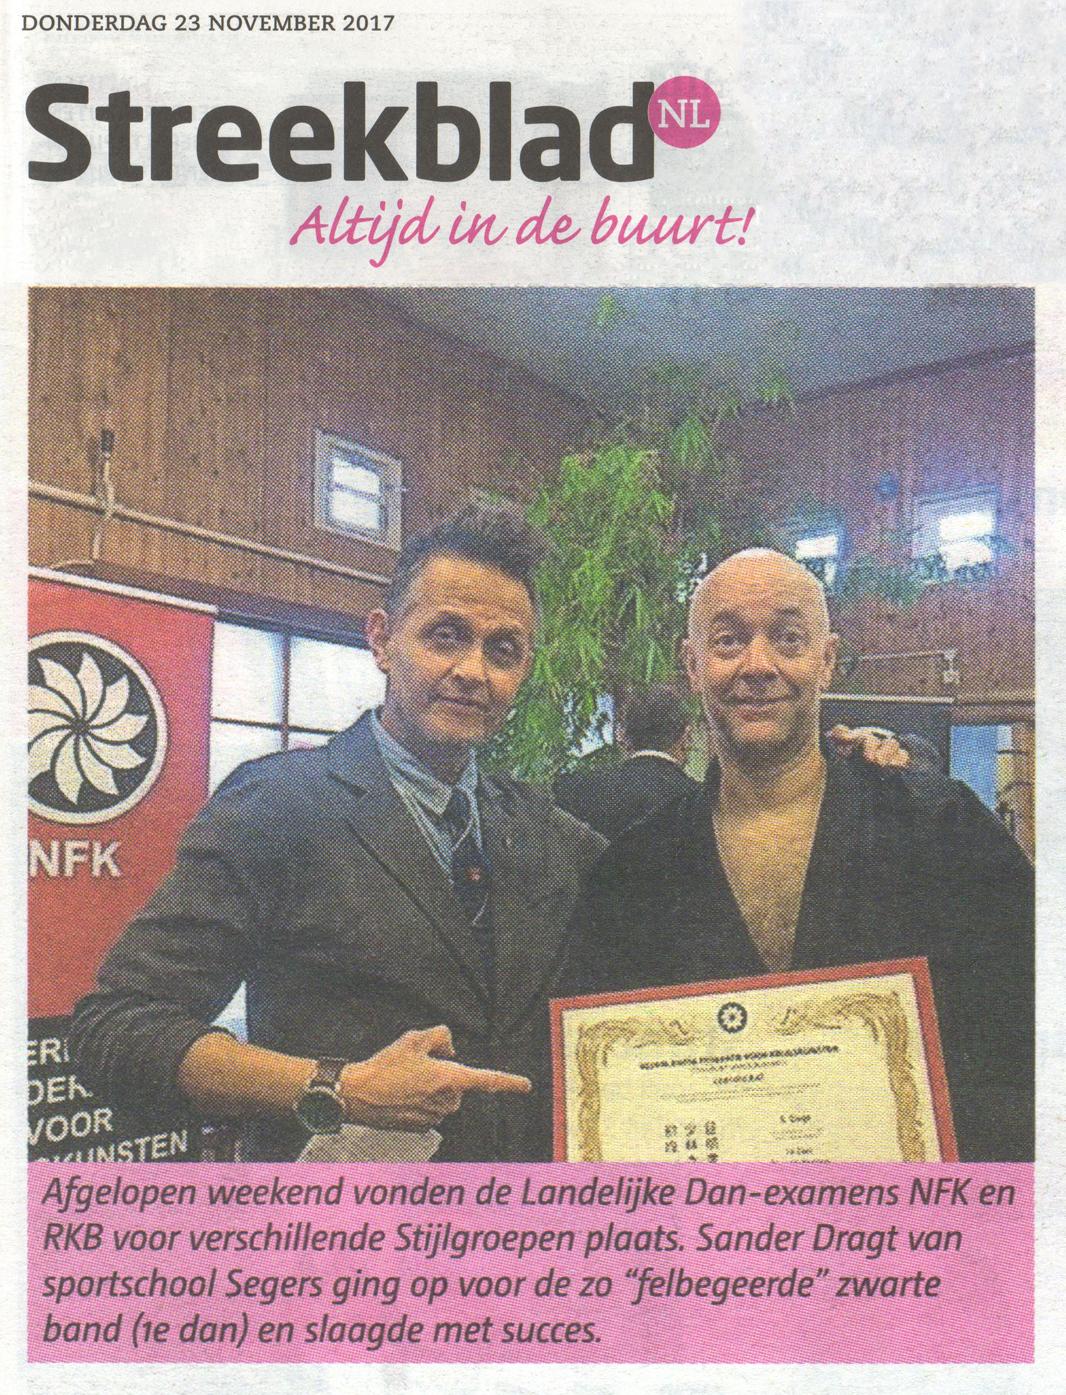 2017-11-23 Streekblad Sander Dragt Zwarte Band 1e dan Shaolin Kempo.jpg